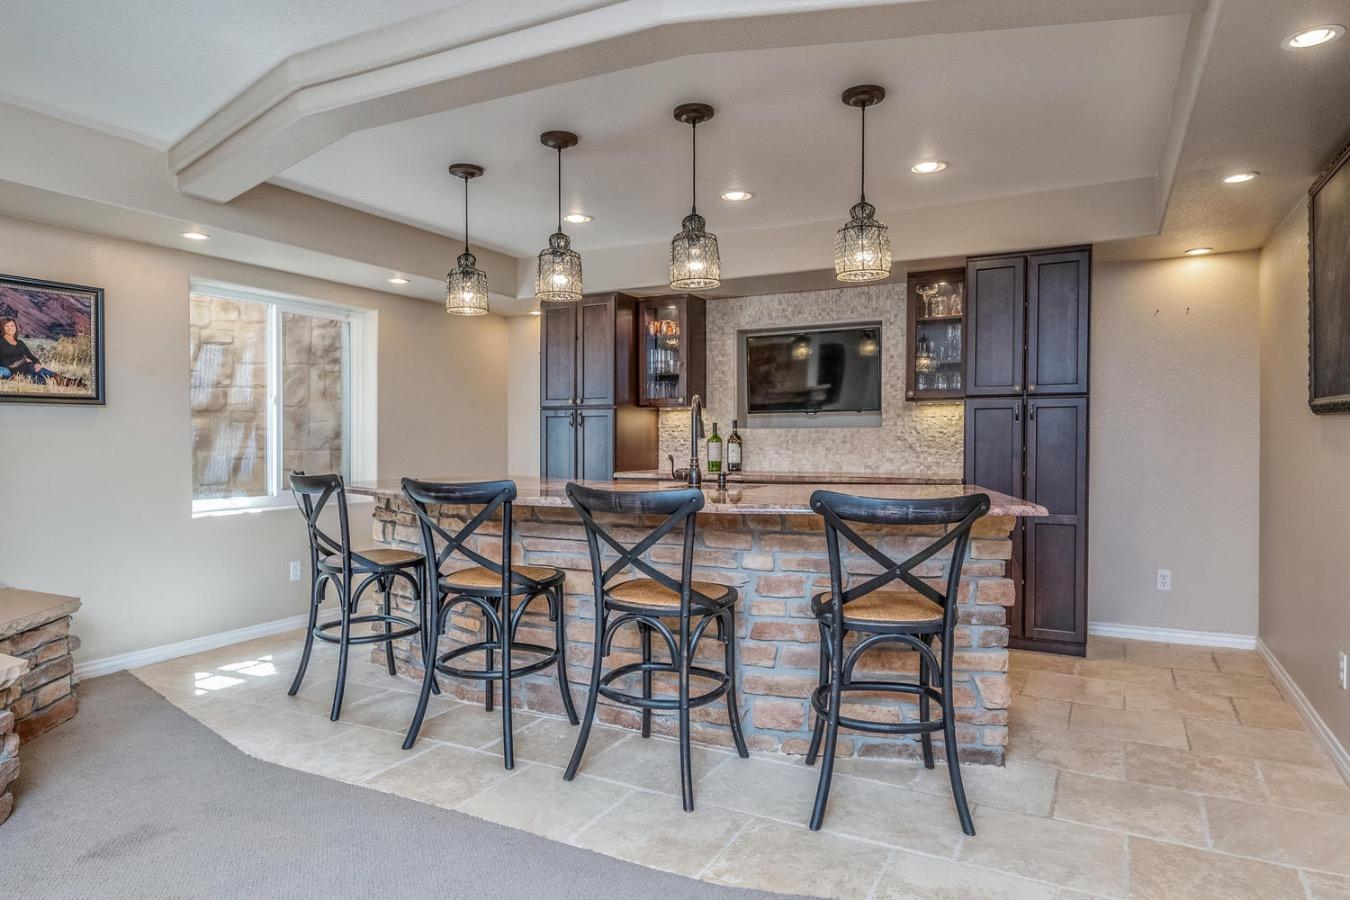 Bar Area/Wine Cooler/Mini Fridge/Dishwasher